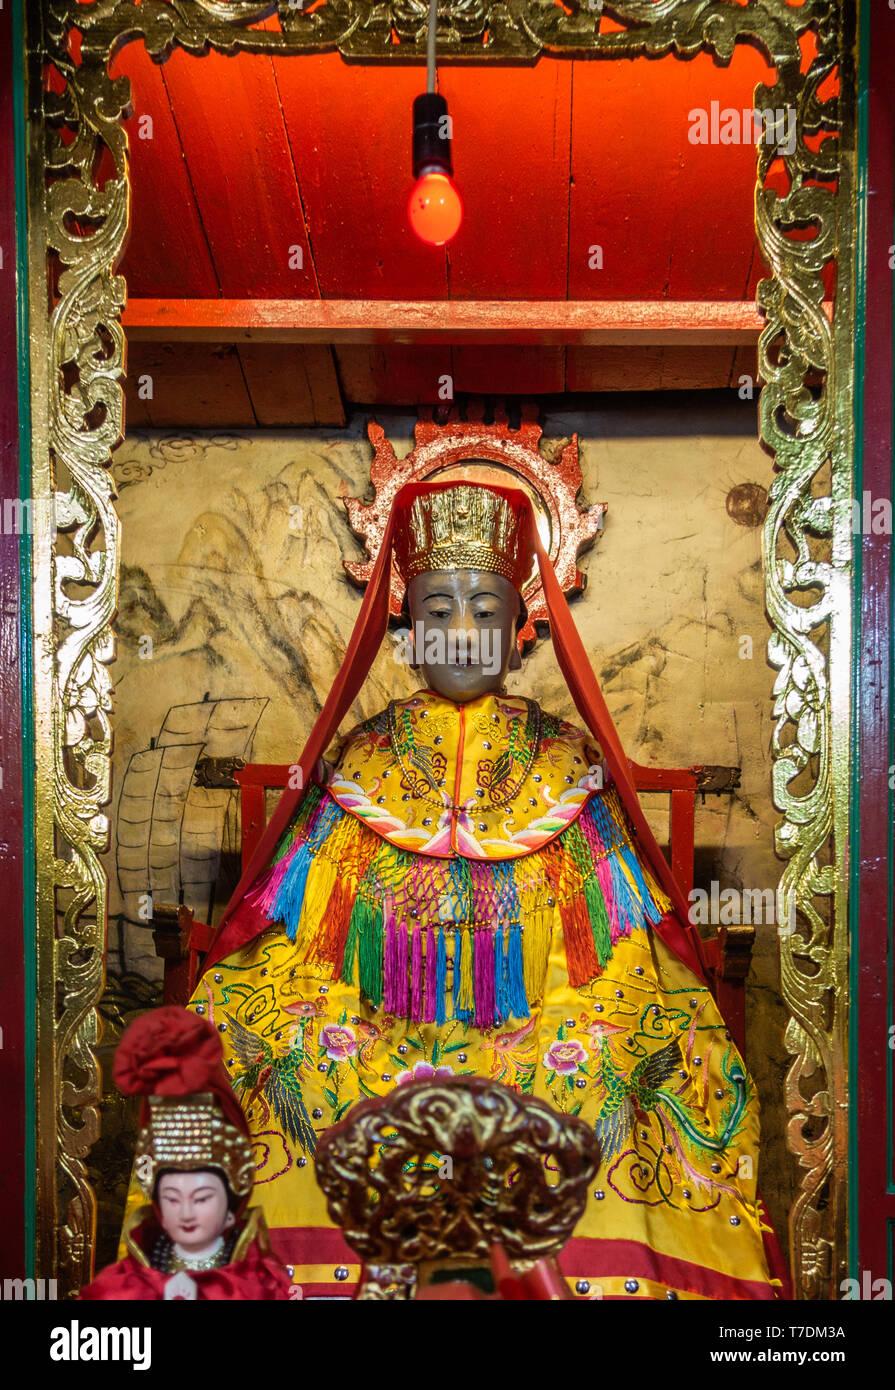 Hong Kong, China - March 7, 2019: Tai O Fishing village. Closeup of God of Sea at Kwan Tai Taoist temple. Wears yellow dress, colorful decorations, re - Stock Image